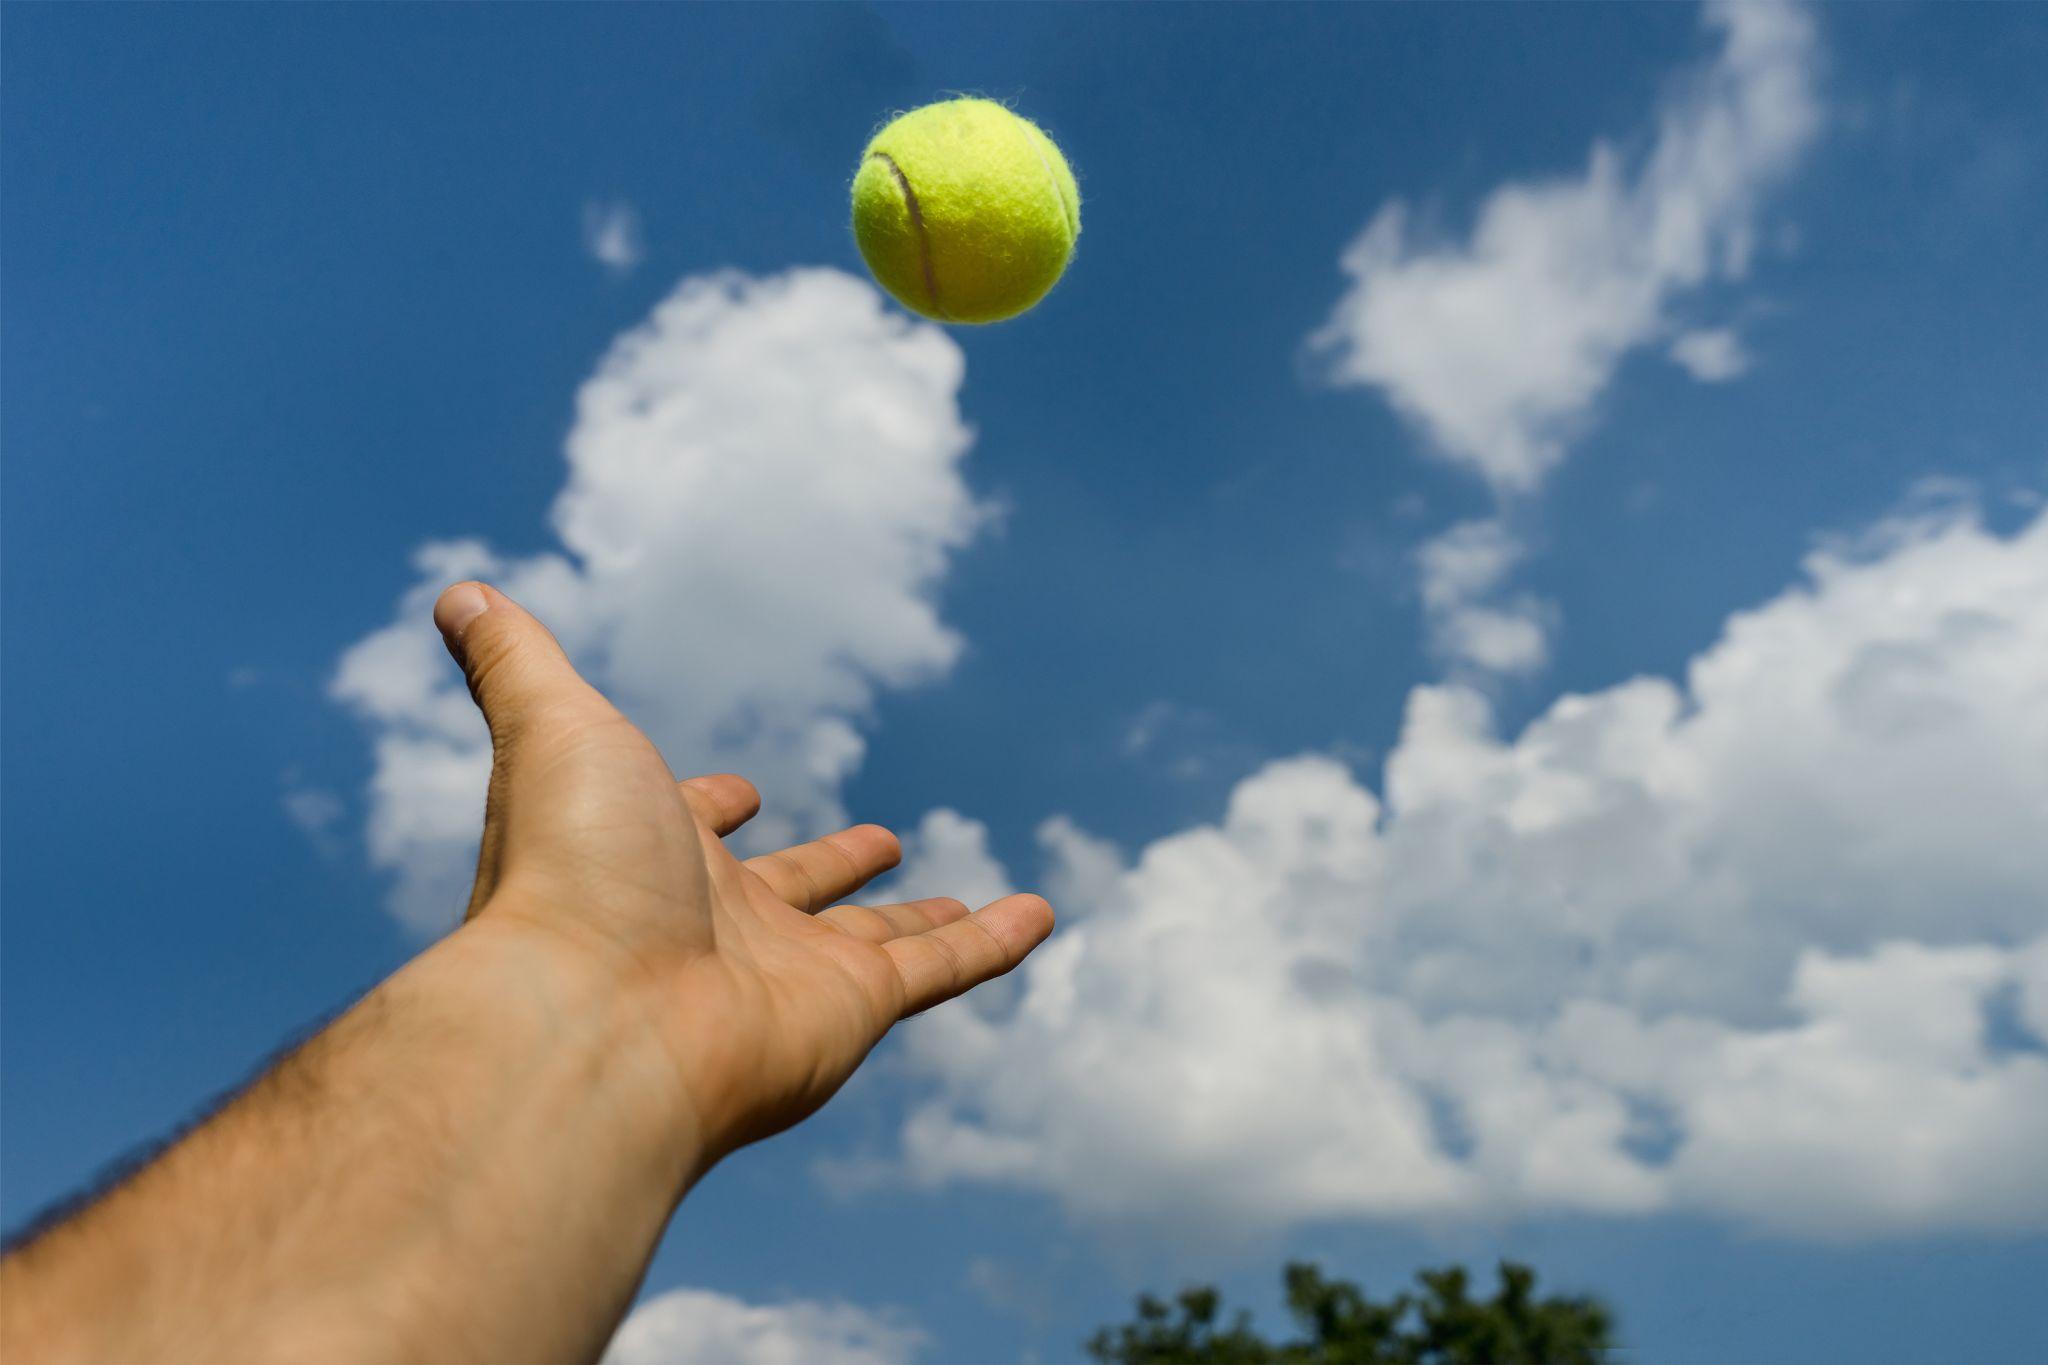 Tennis, pickleball get no love from Gov. Newsom's outdoor activities list